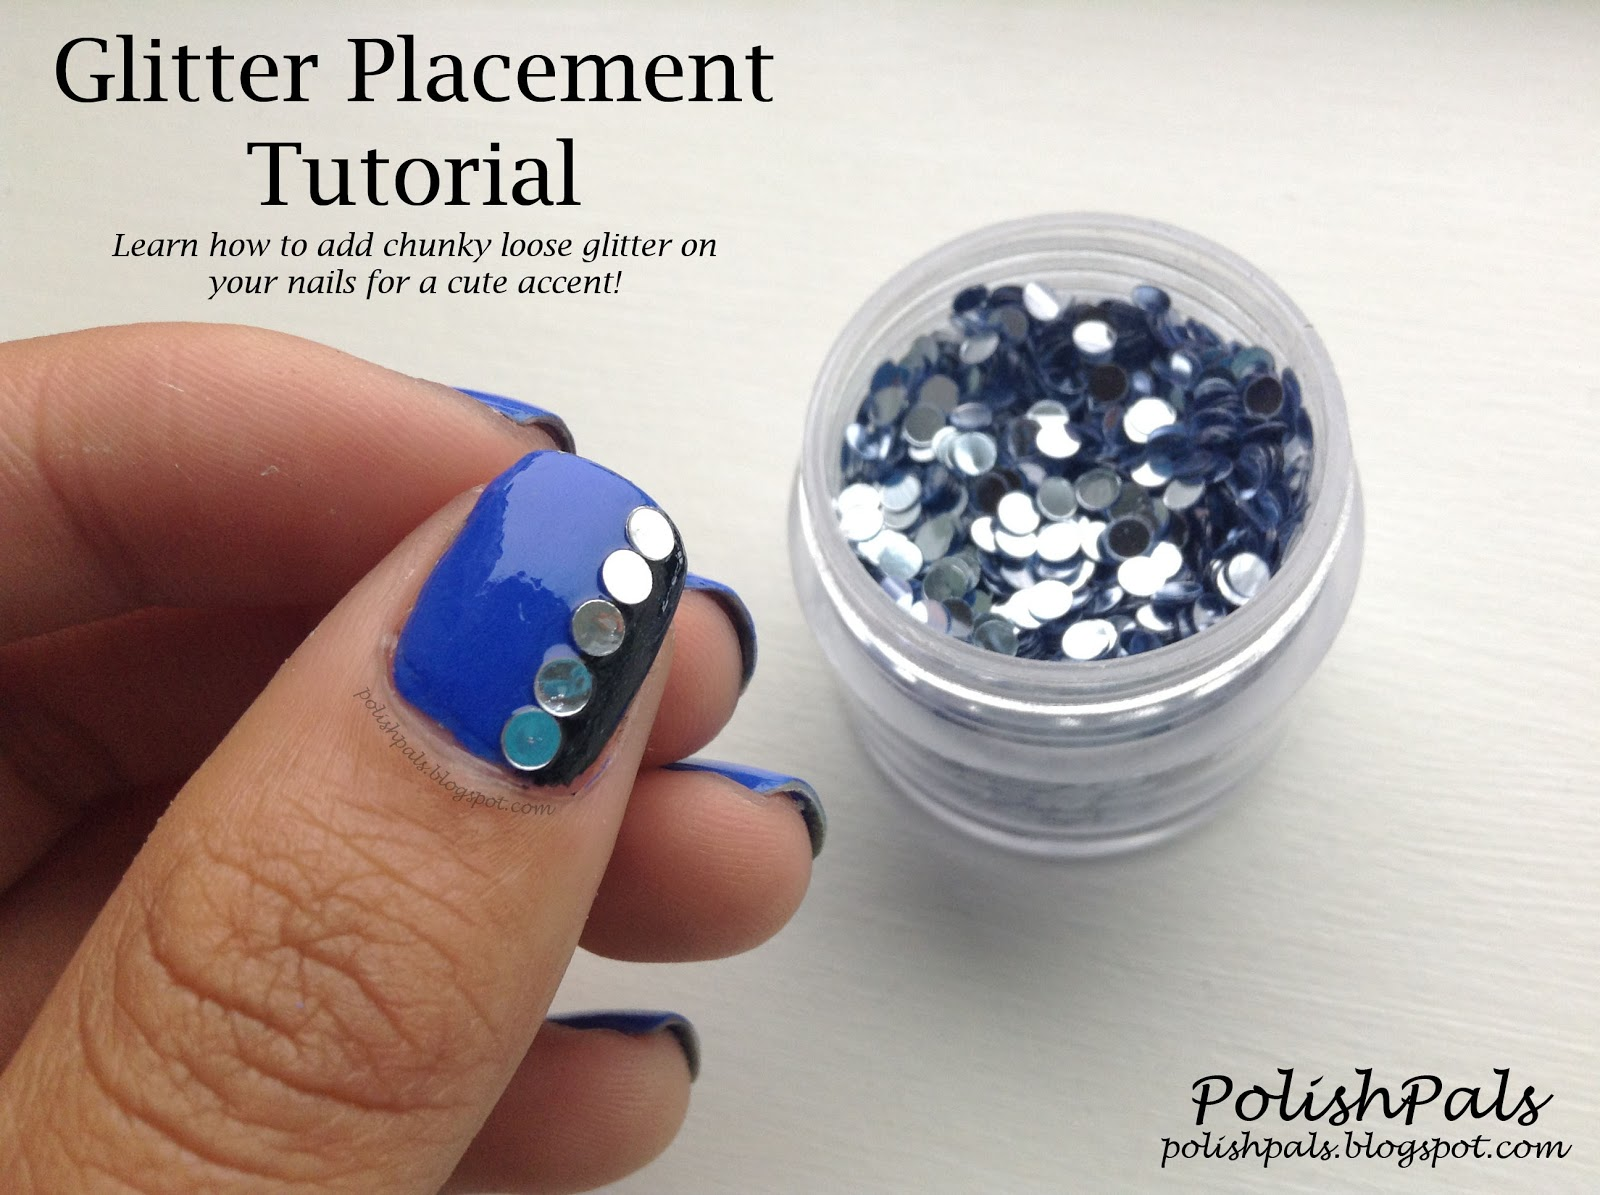 Polish Pals: Glitter Placement Tutorial